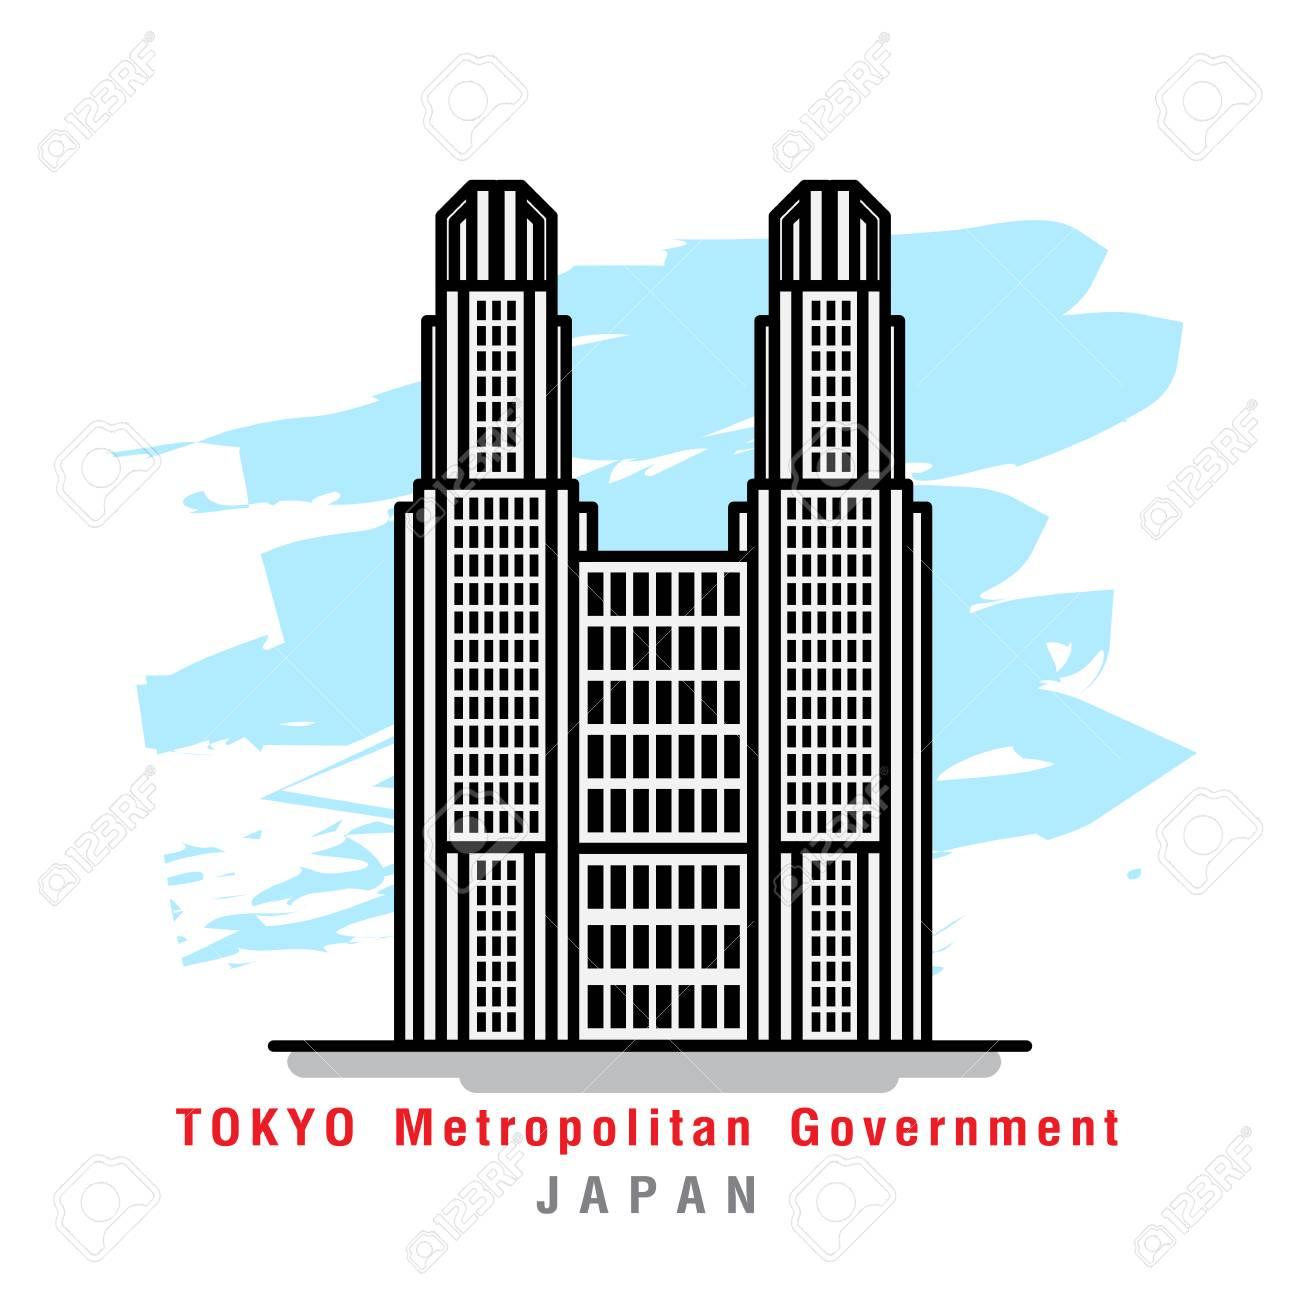 Illustrator of Tokyo Metropolitan Goverment. Vector Illustration - 82930092